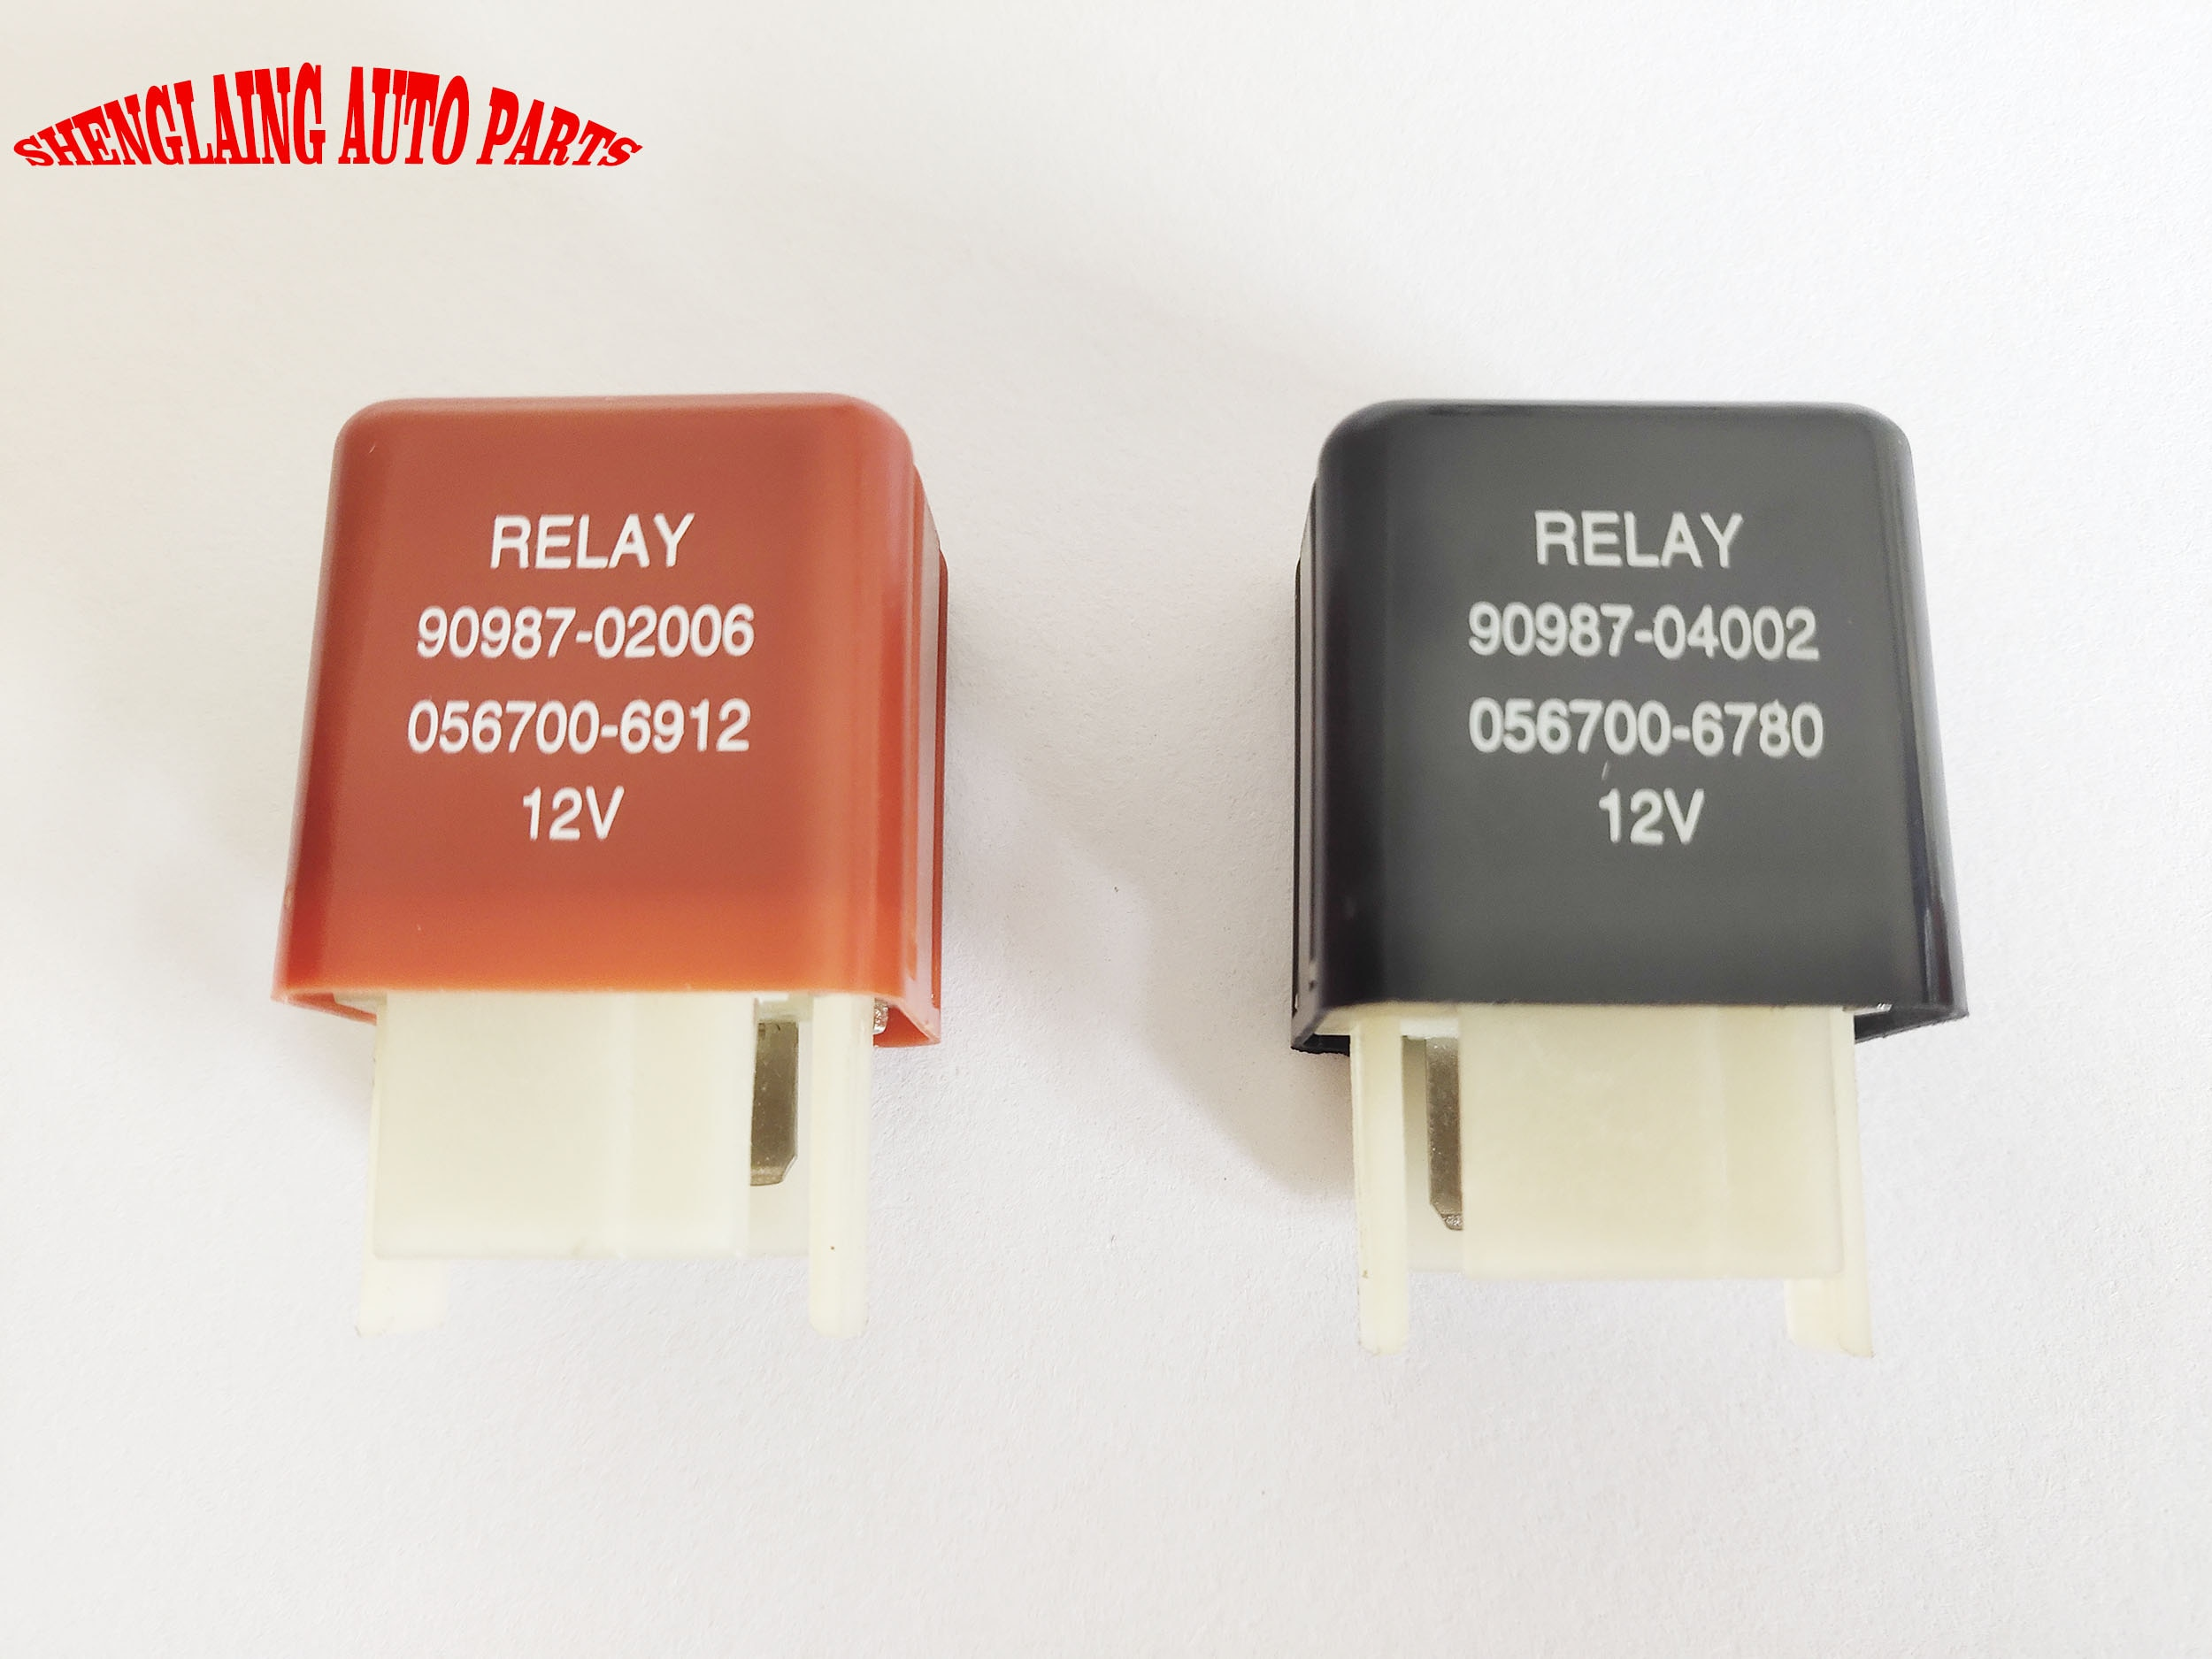 Car Relay  for  Camry 90987-02006  12V 4PIN  / 90987-04002 12V 5PIN Radiator Fan Relay Blower Motor Relay